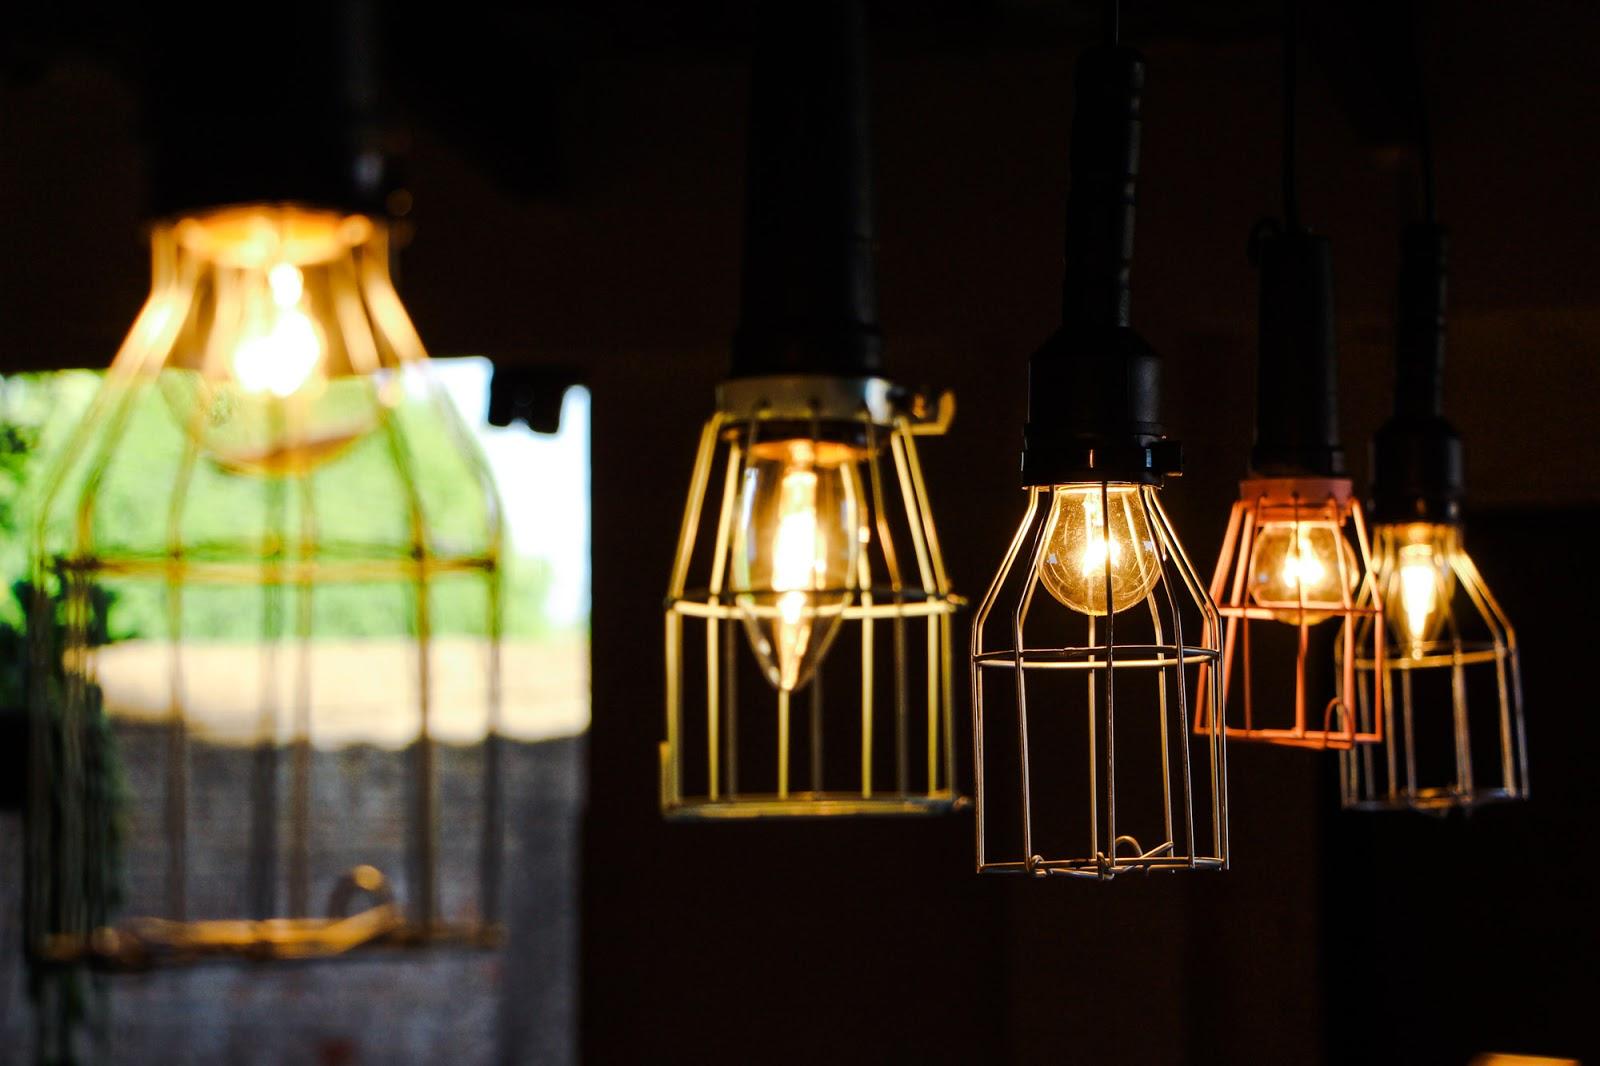 luminaria industrial barata DIY